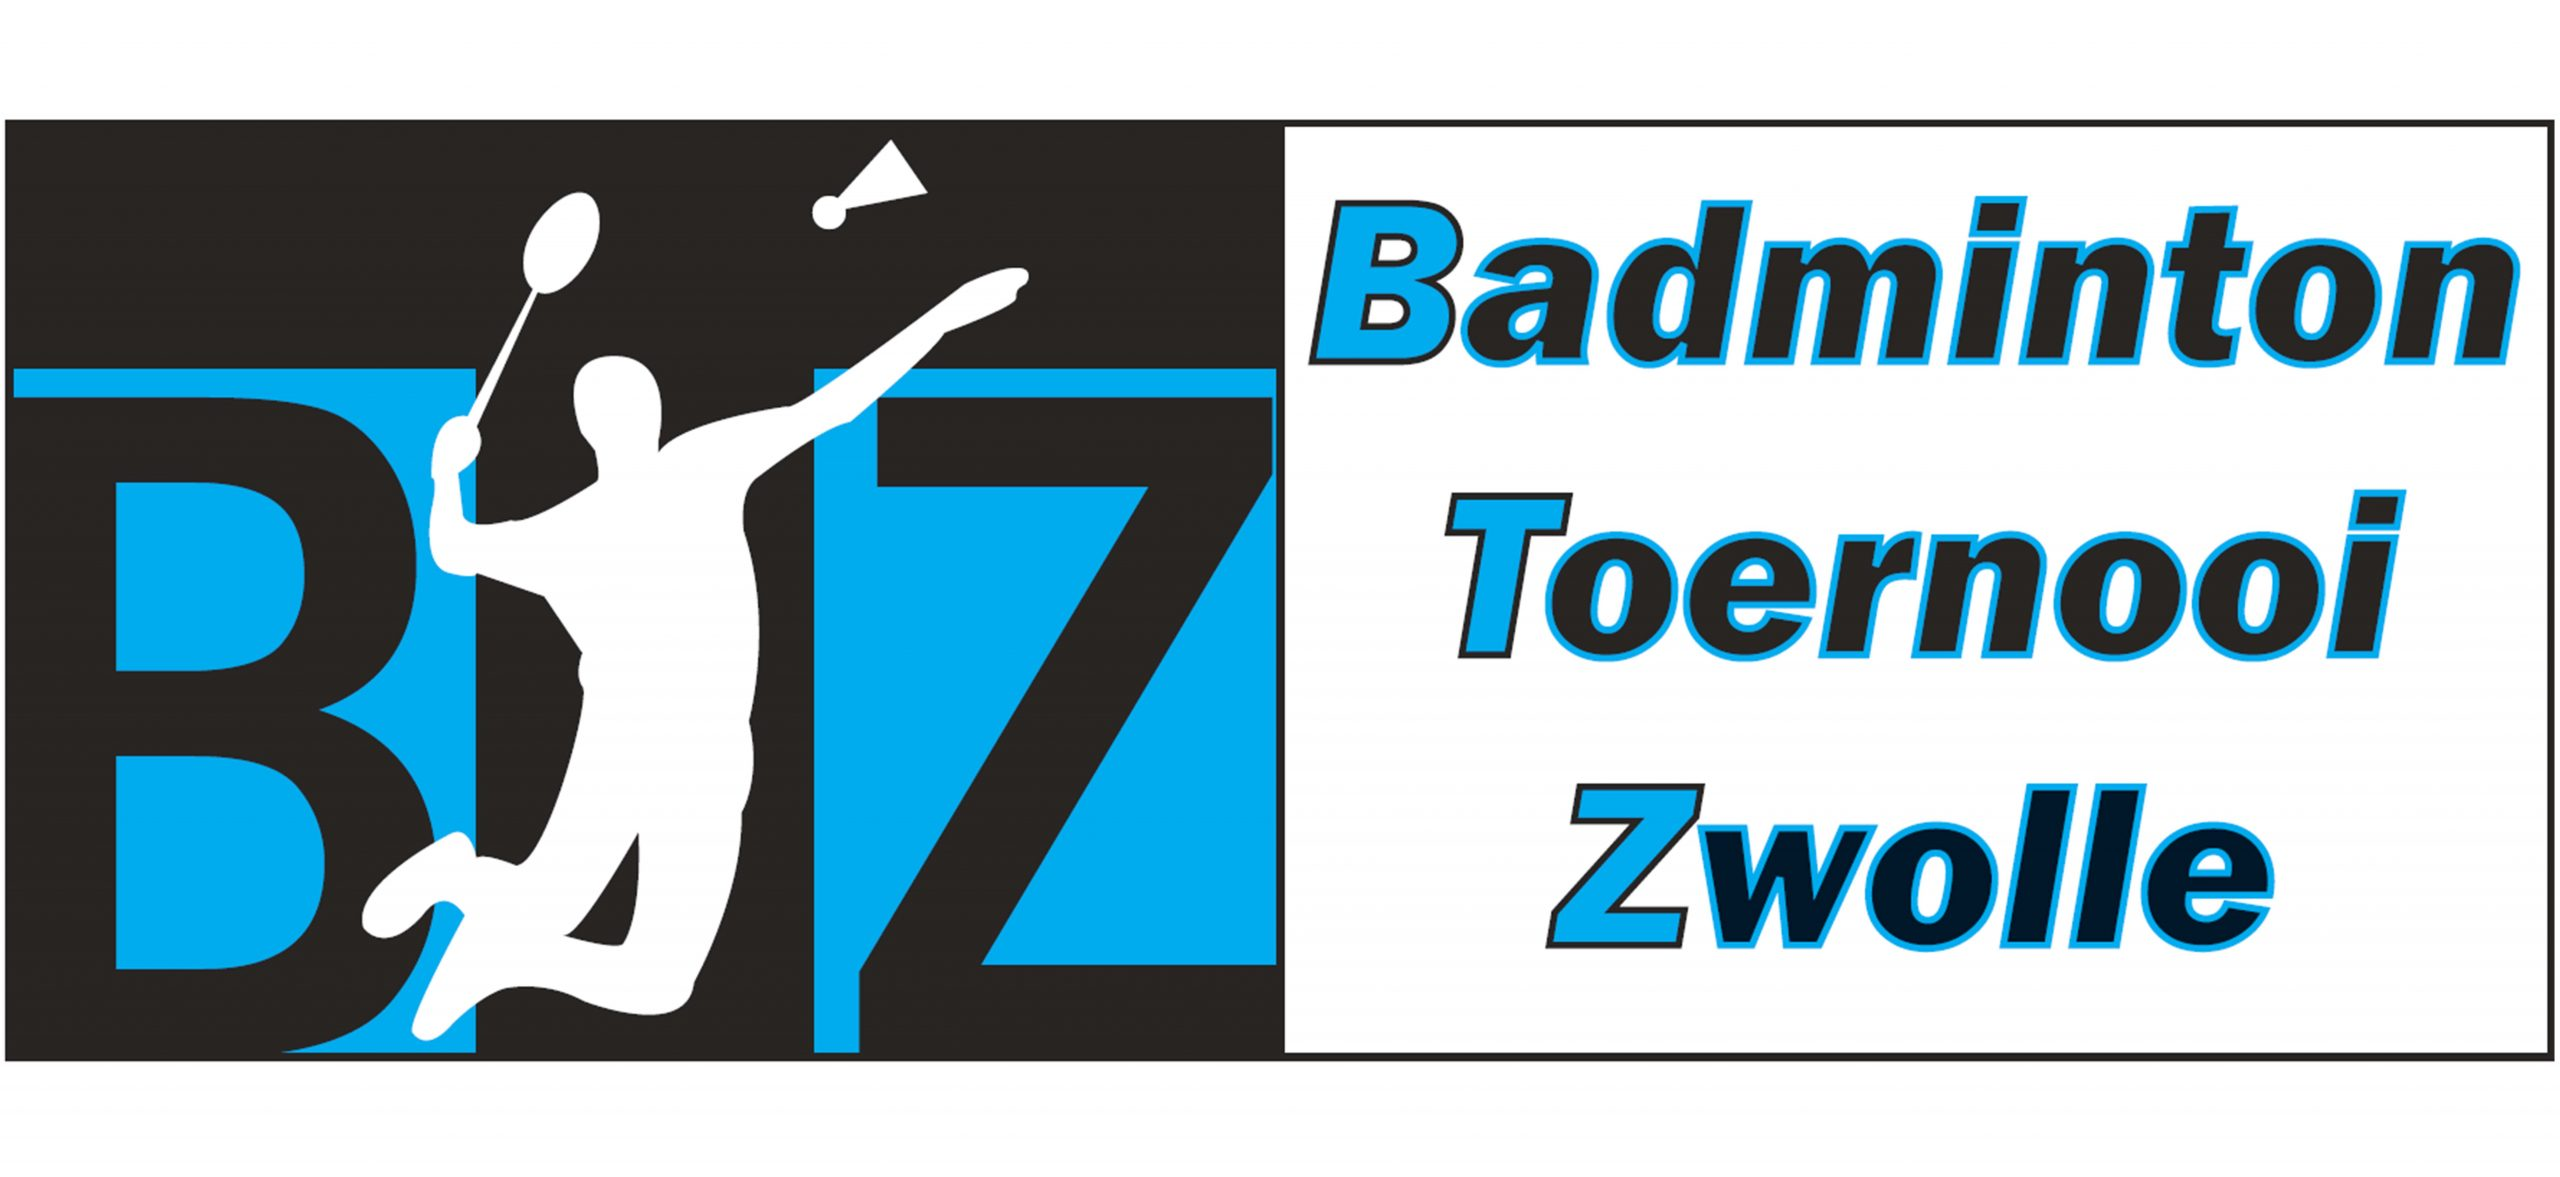 Badminton Toernooi Zwolle